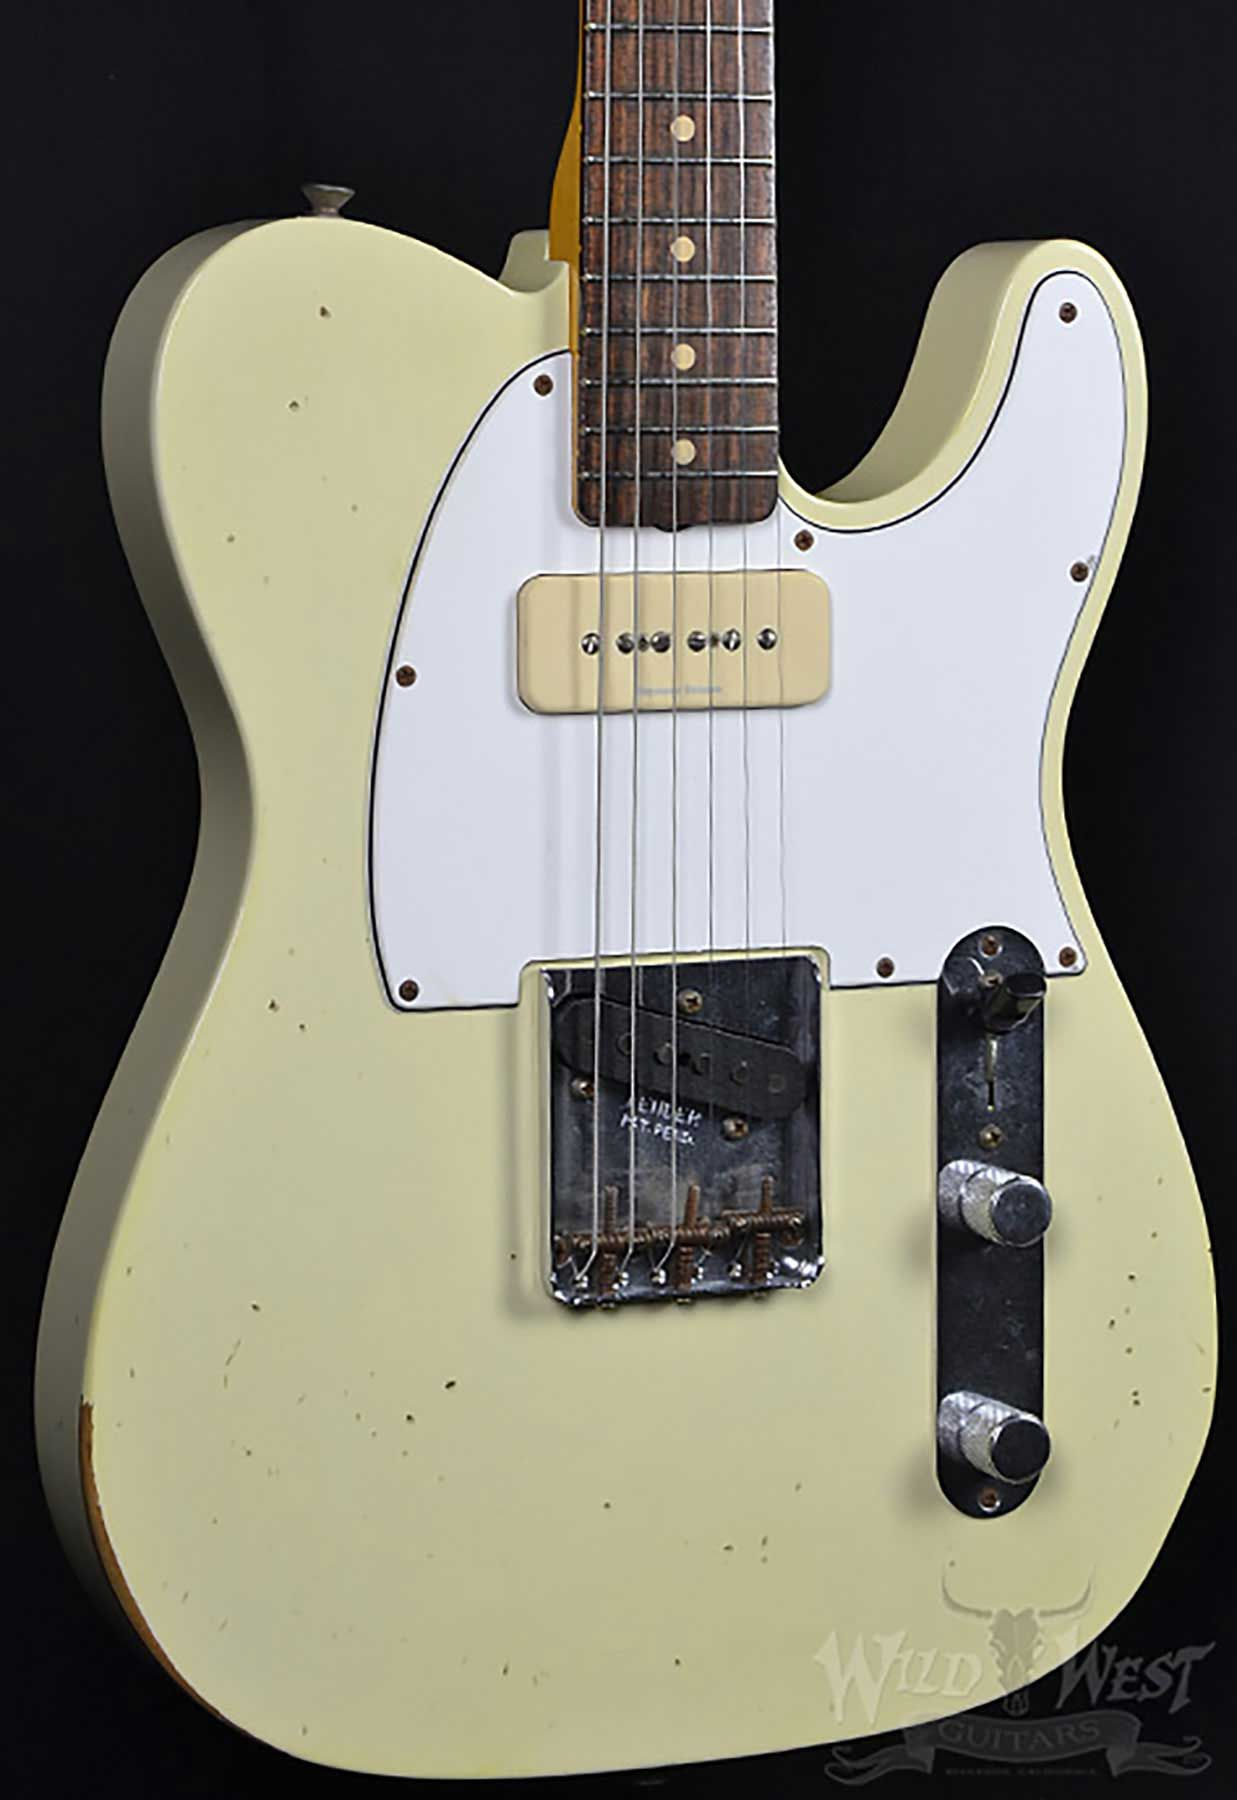 fender 1963 p90 telecaster relic faded vintage white guitar wiring 1963 fender telecaster wiring diagram [ 1237 x 1800 Pixel ]